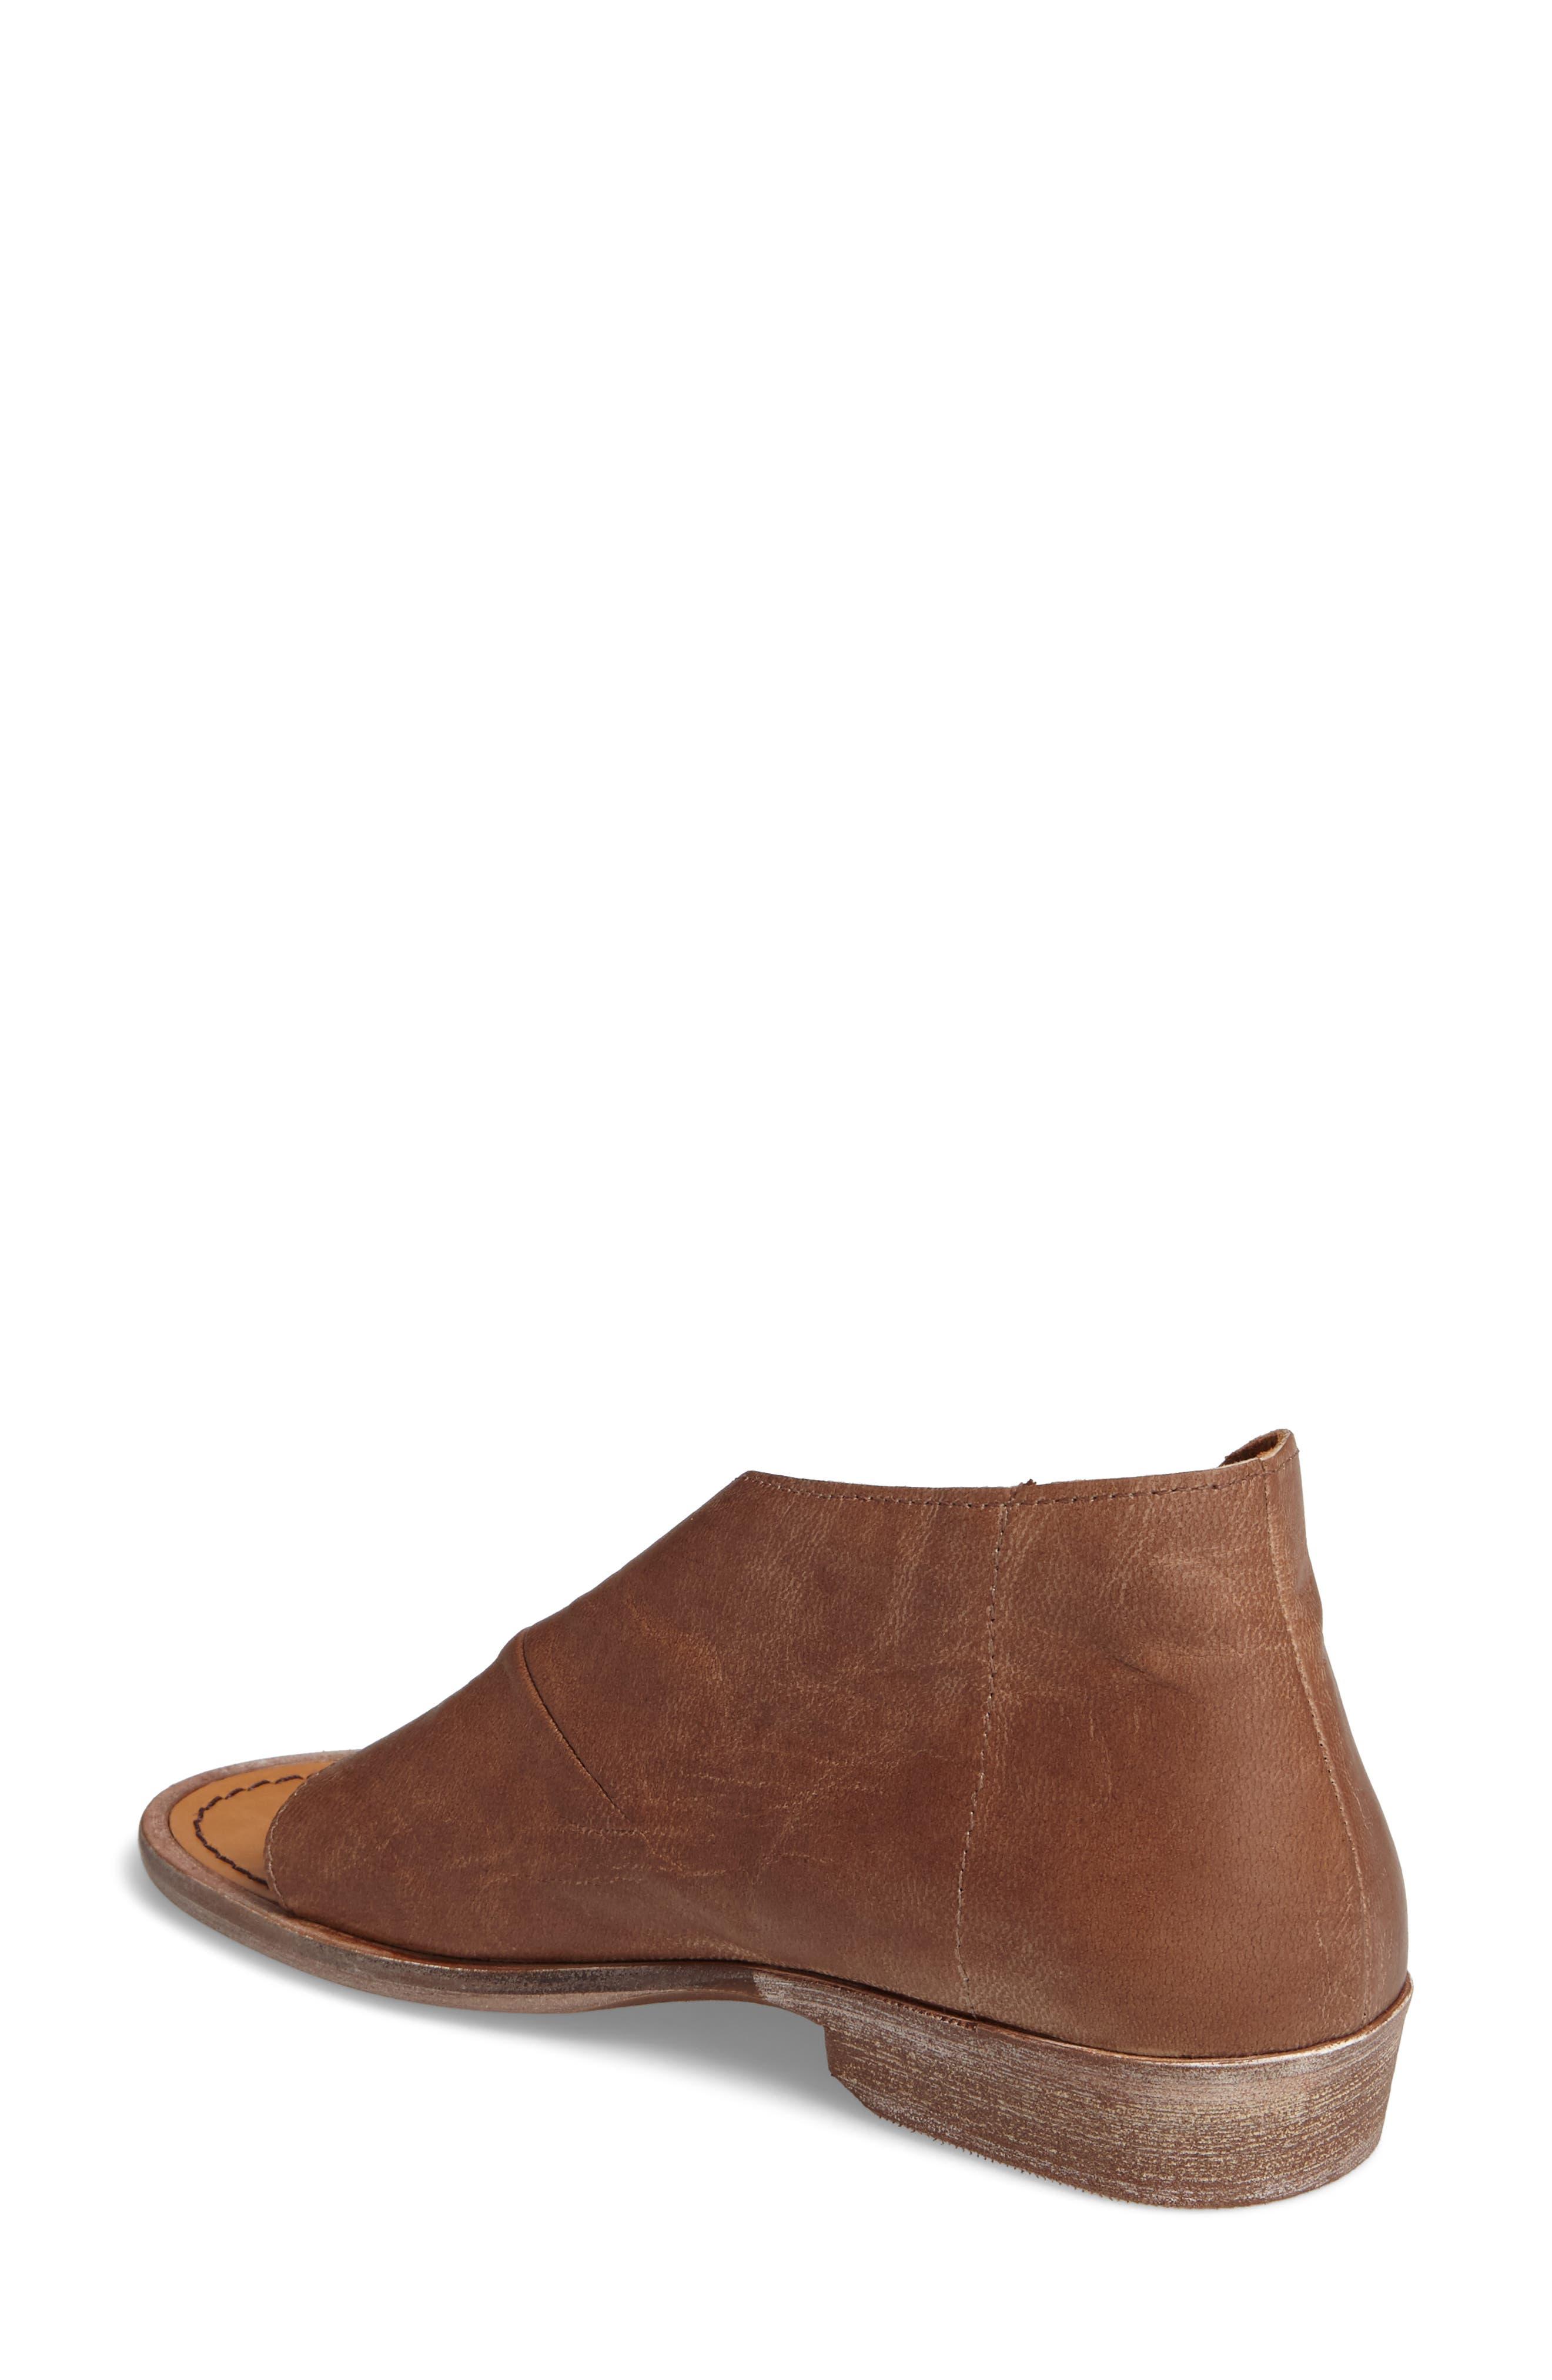 'Mont Blanc' Asymmetrical Sandal,                             Alternate thumbnail 25, color,